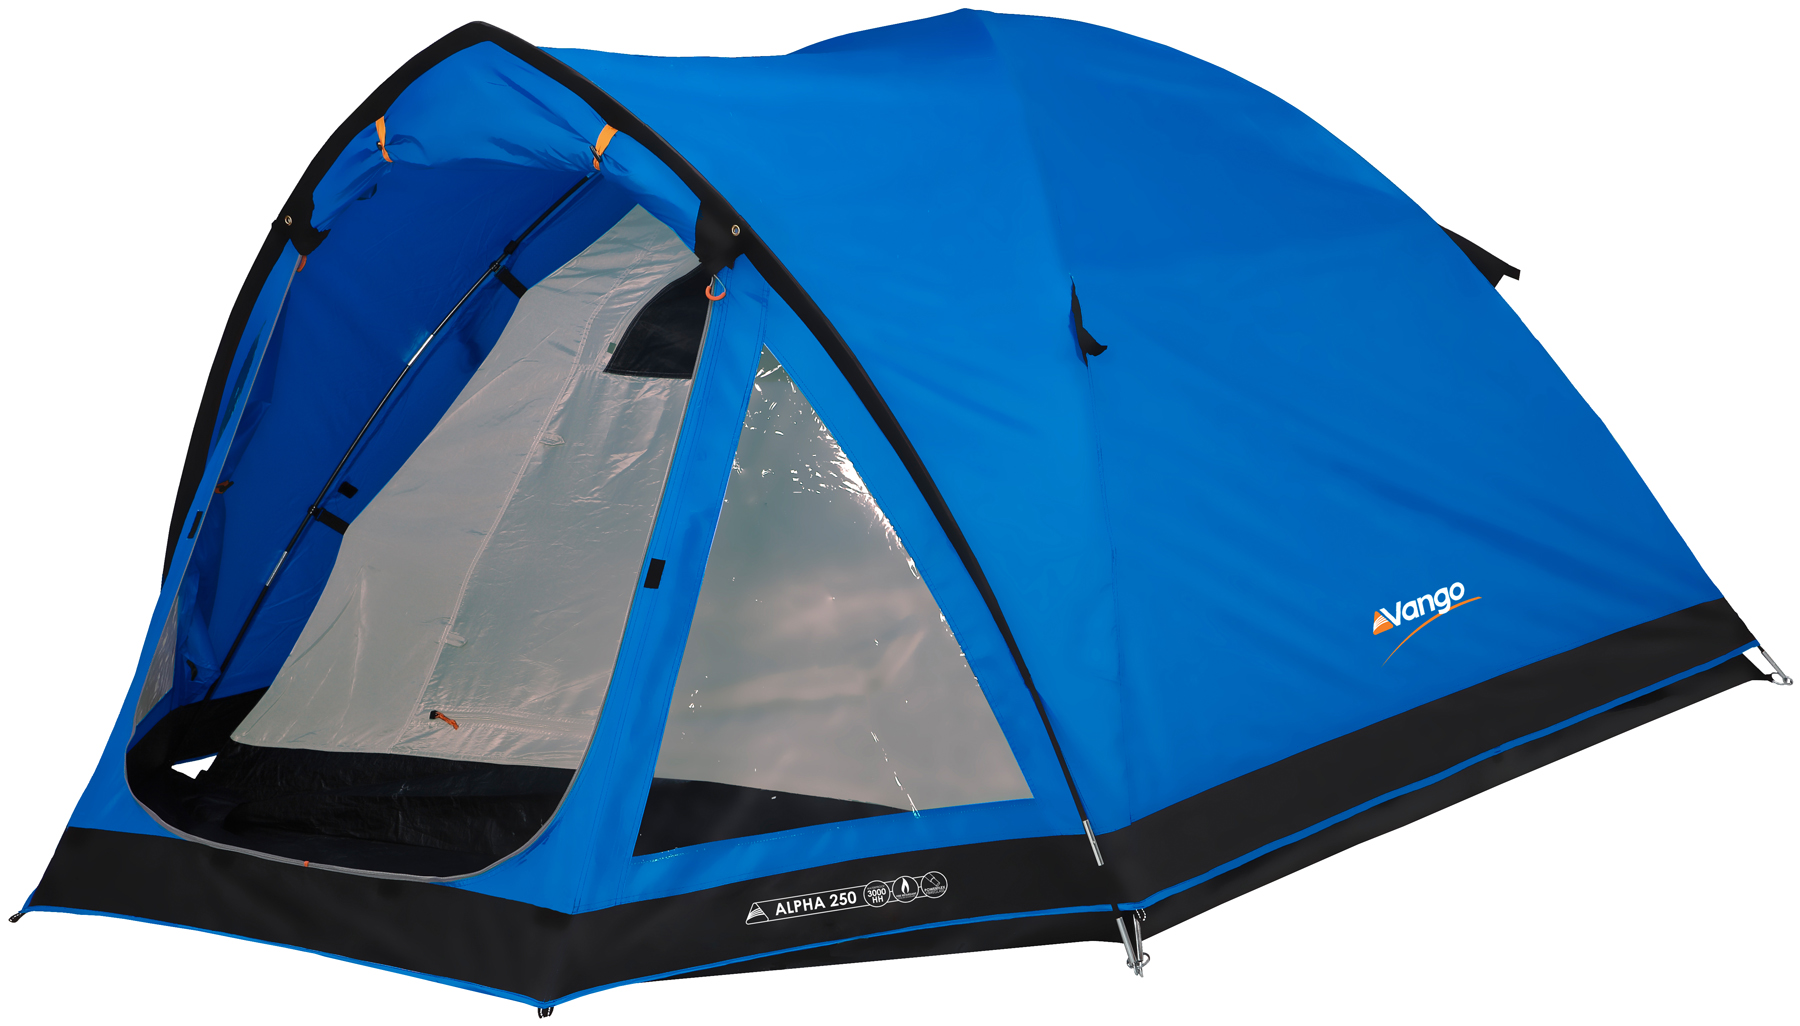 tente vango alpha 250 atlantic 2 places raviday camping. Black Bedroom Furniture Sets. Home Design Ideas